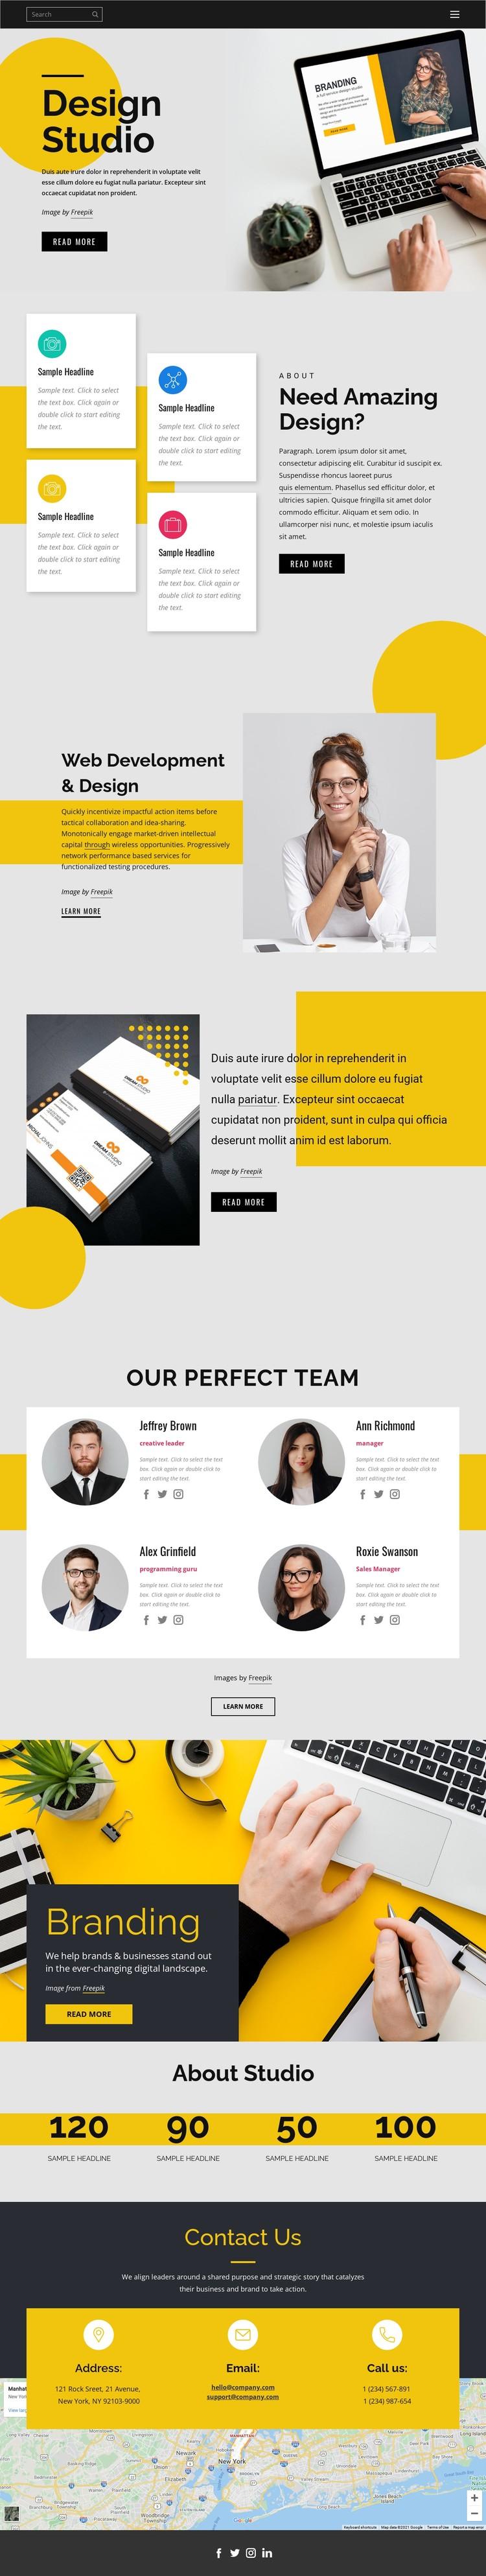 Brand, print & web design CSS Template